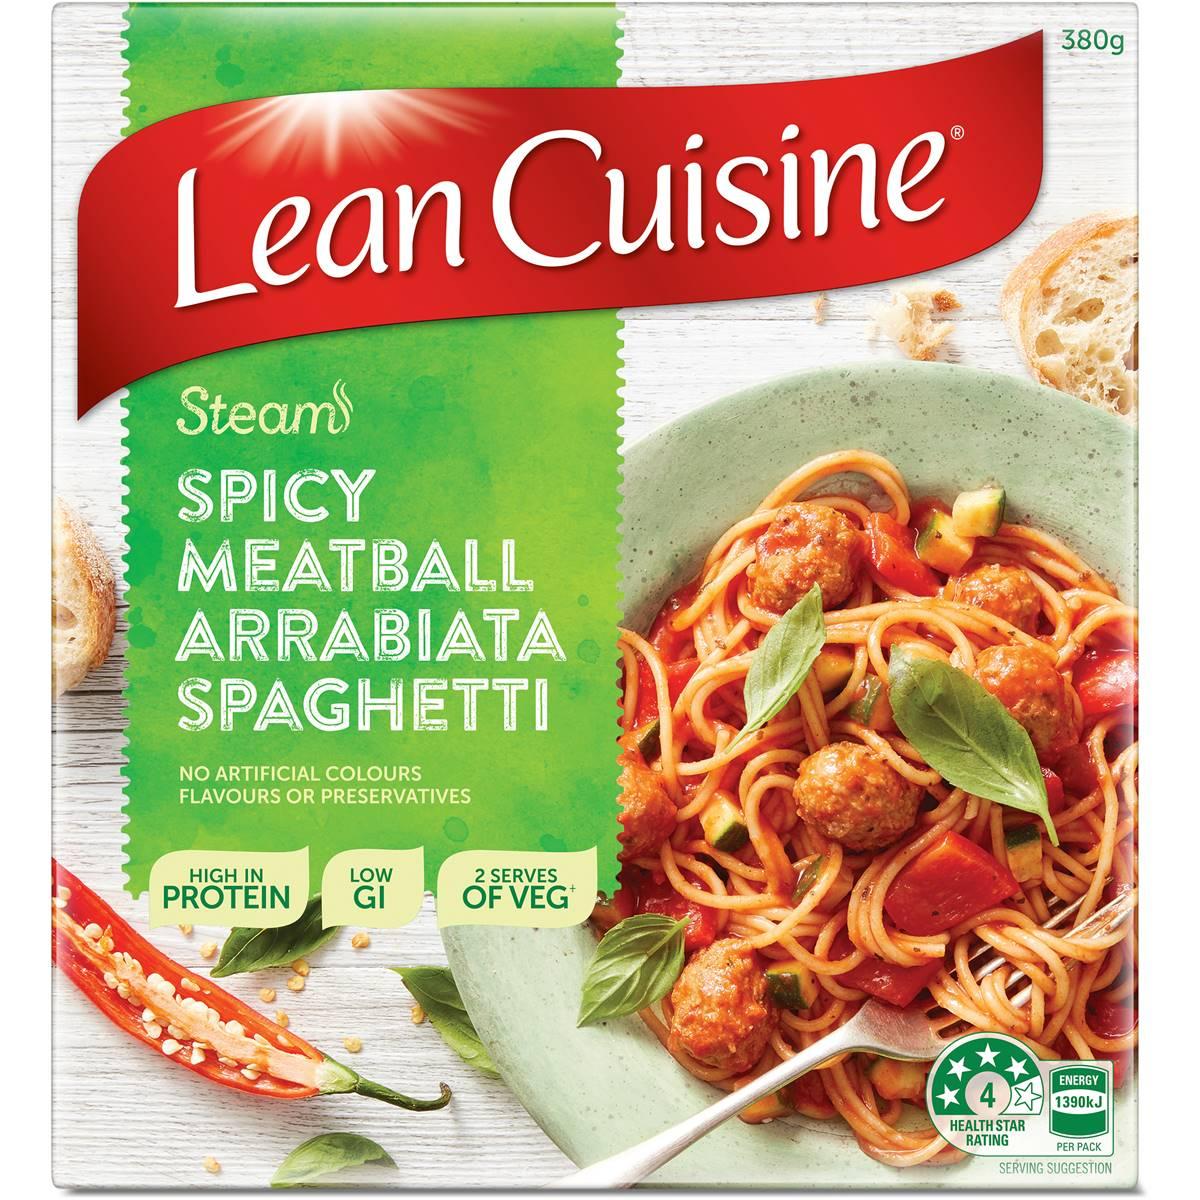 Woolworths lean cuisine steam meatball arrabbiata for Average price of lean cuisine